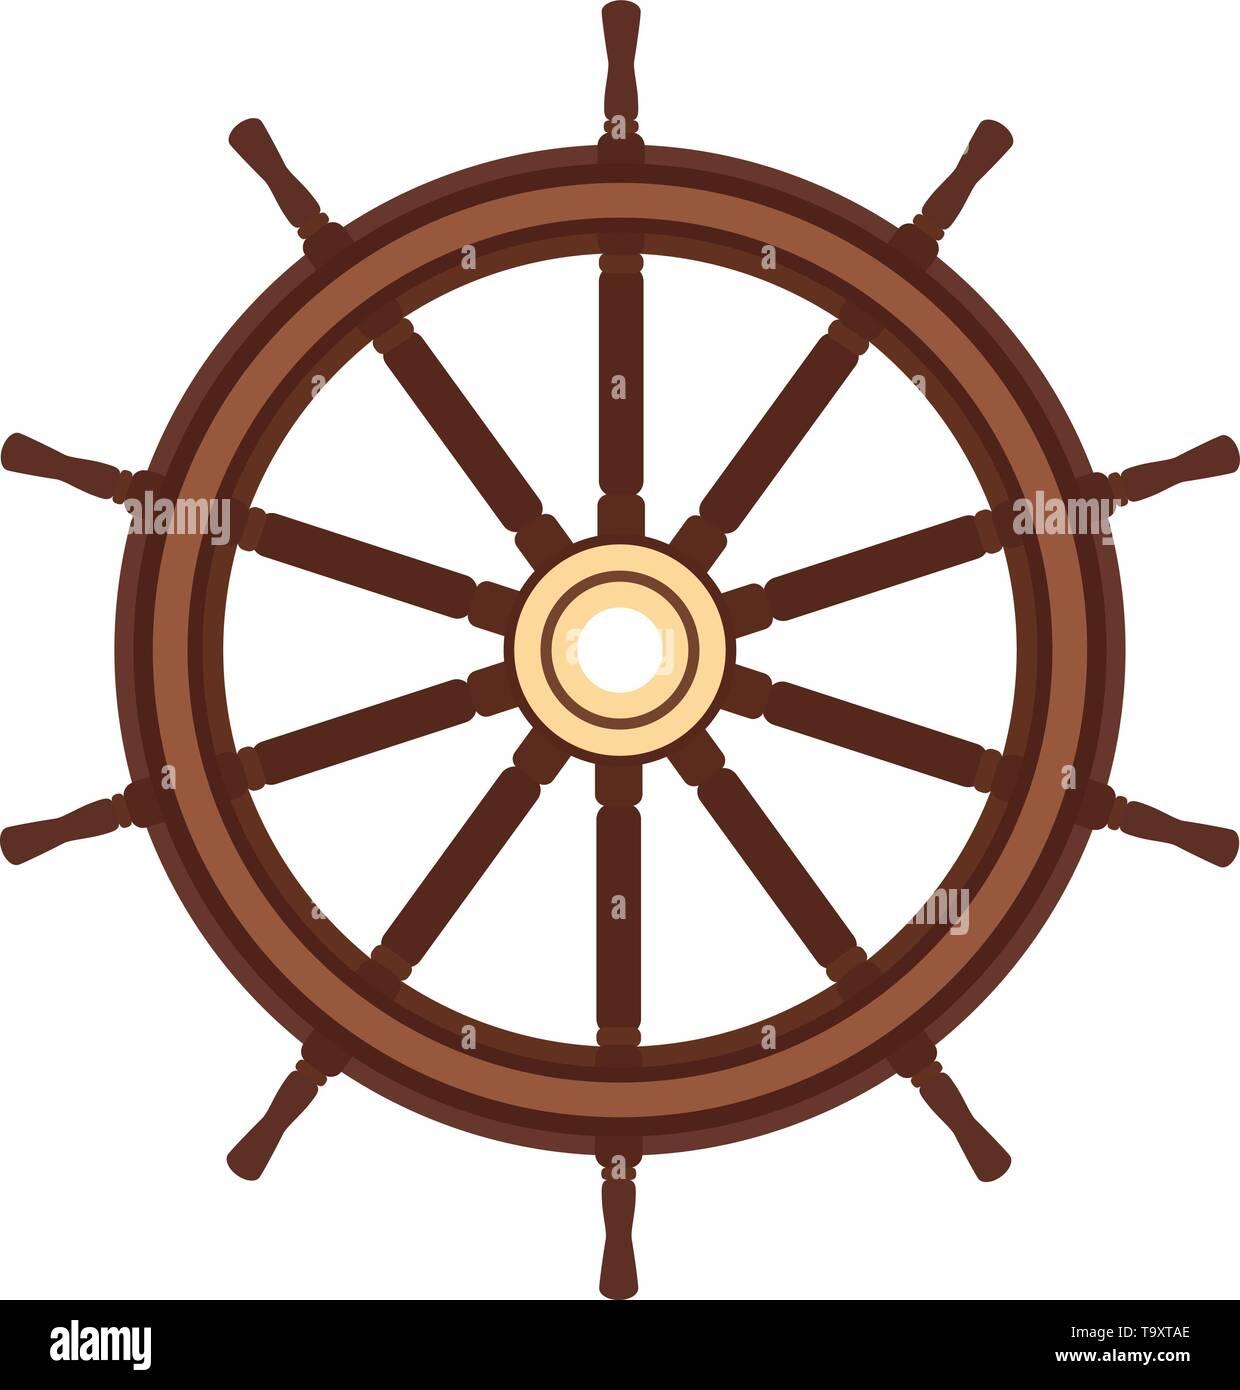 vector flat boat handwheel, ship wheel helm. Sea, ocean symbol - Stock Image